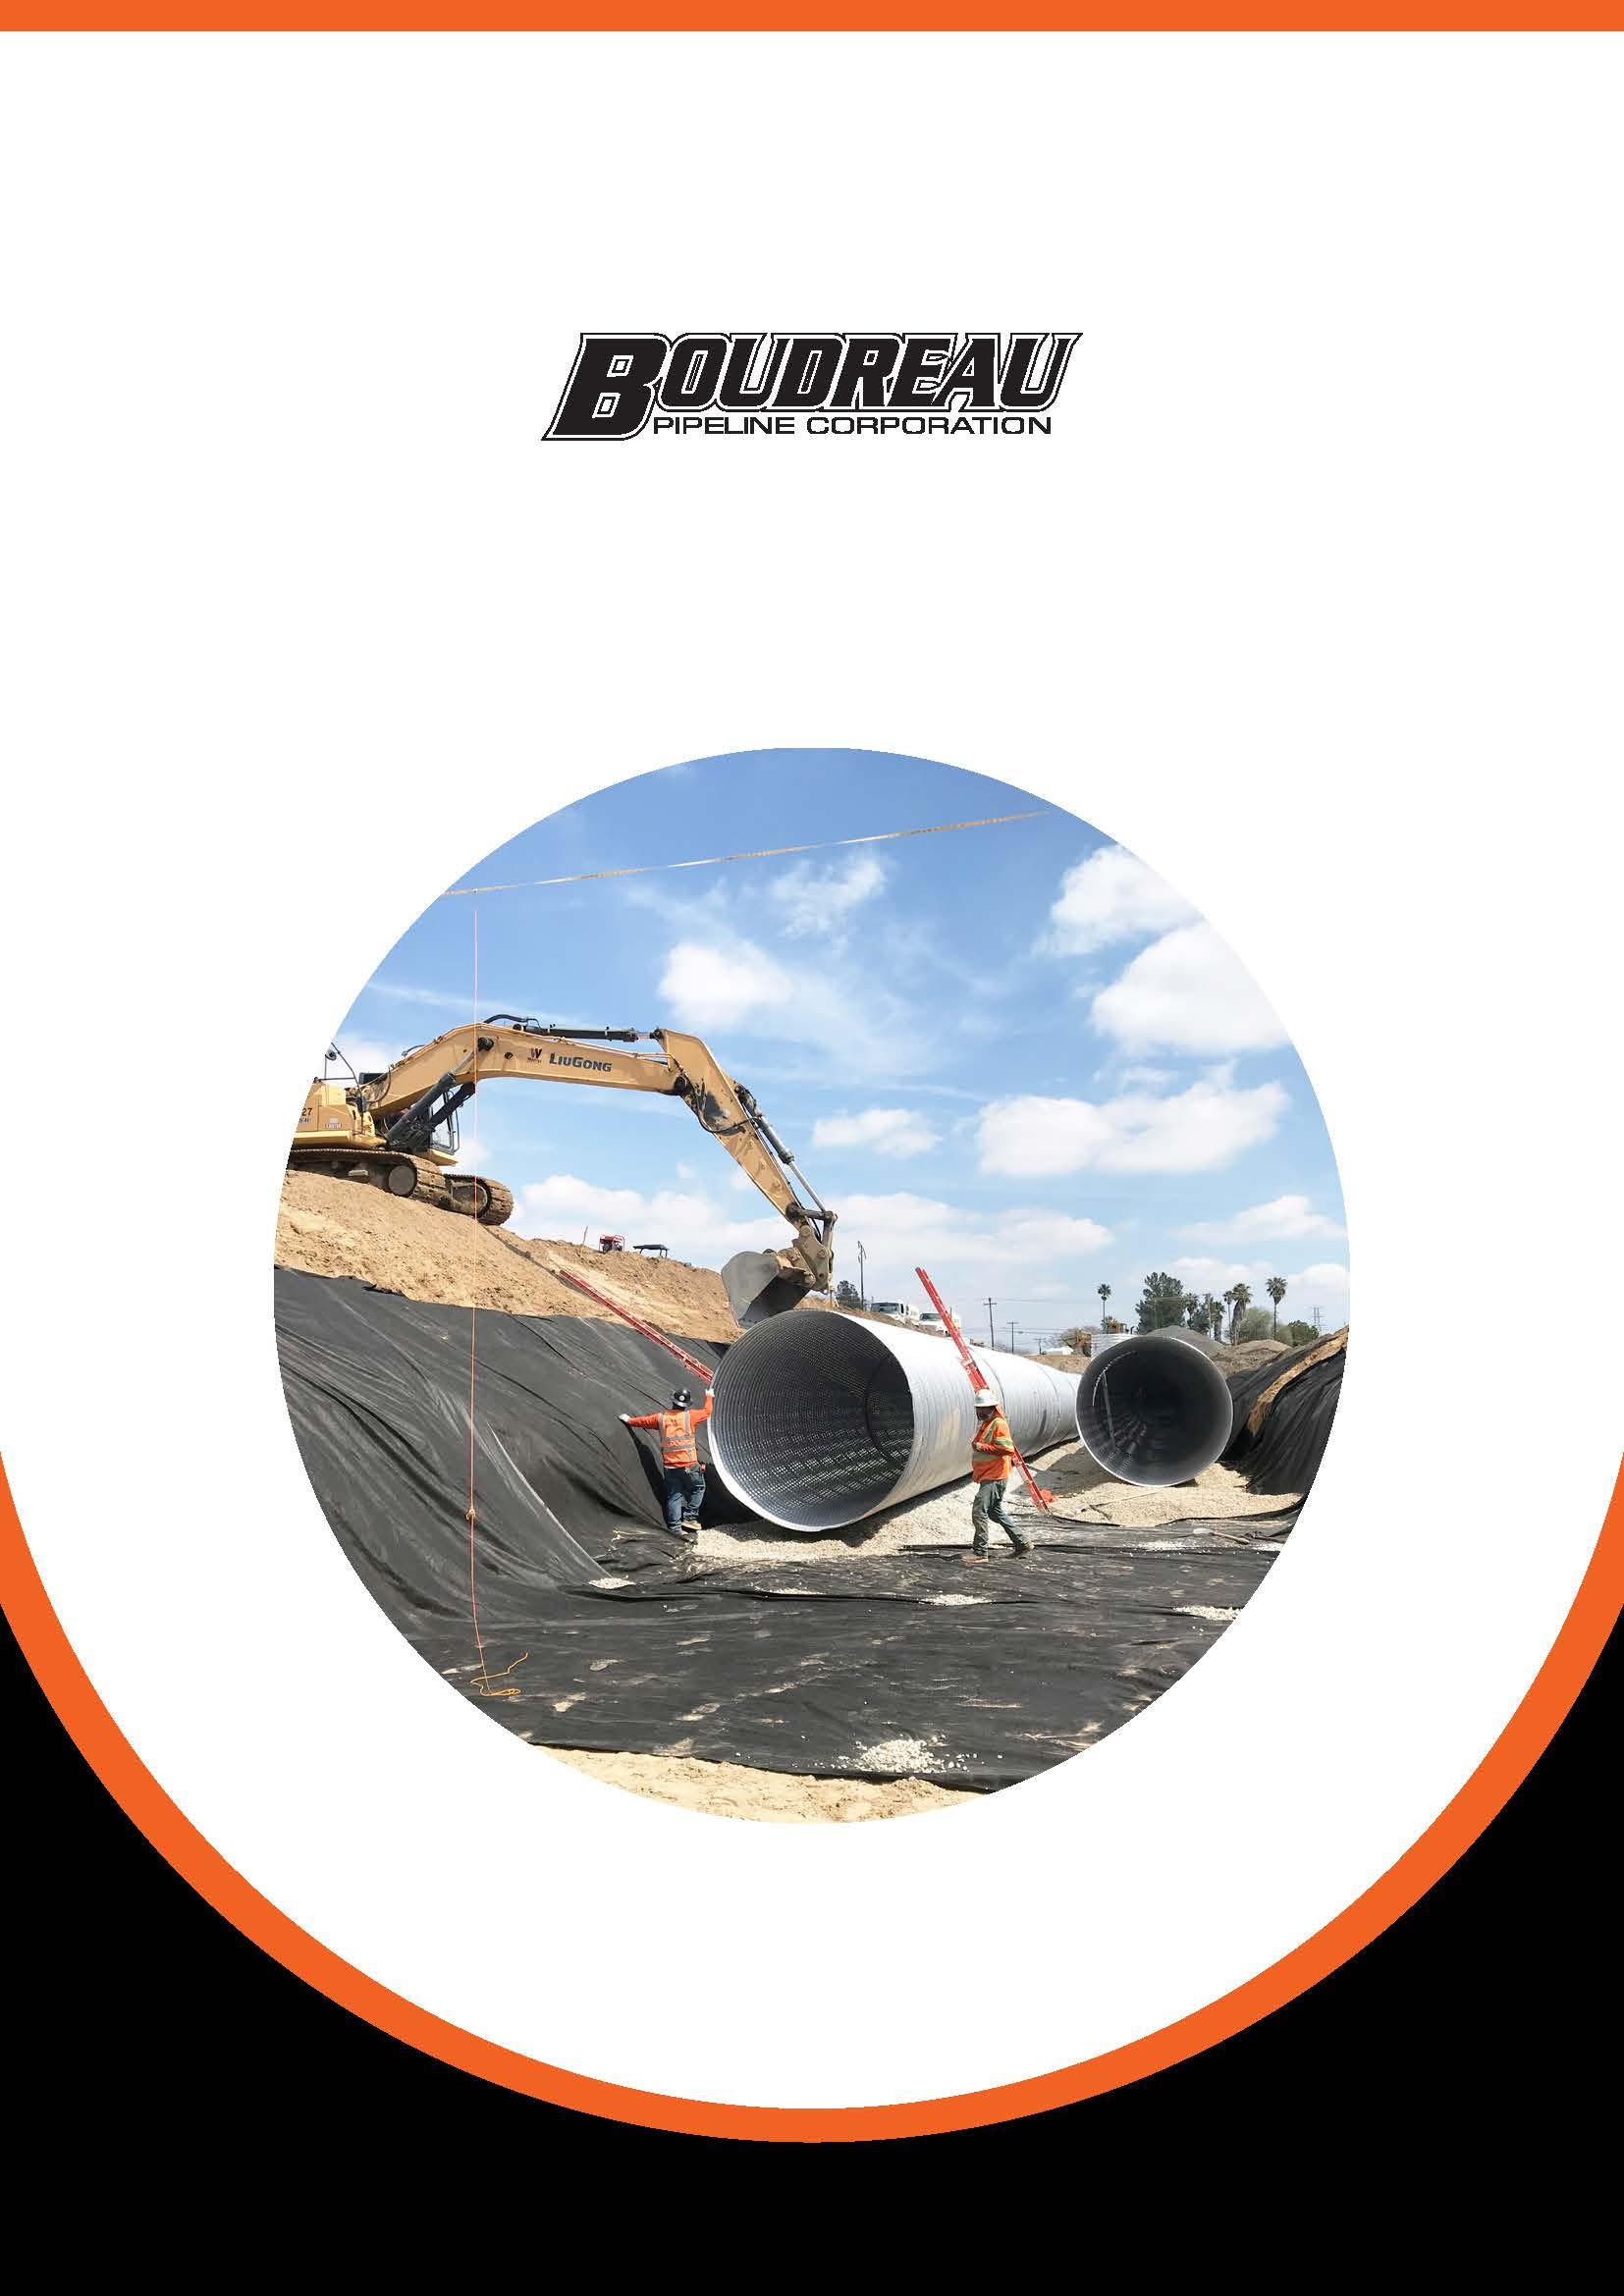 boudreau_pipeline_Page_1.jpg